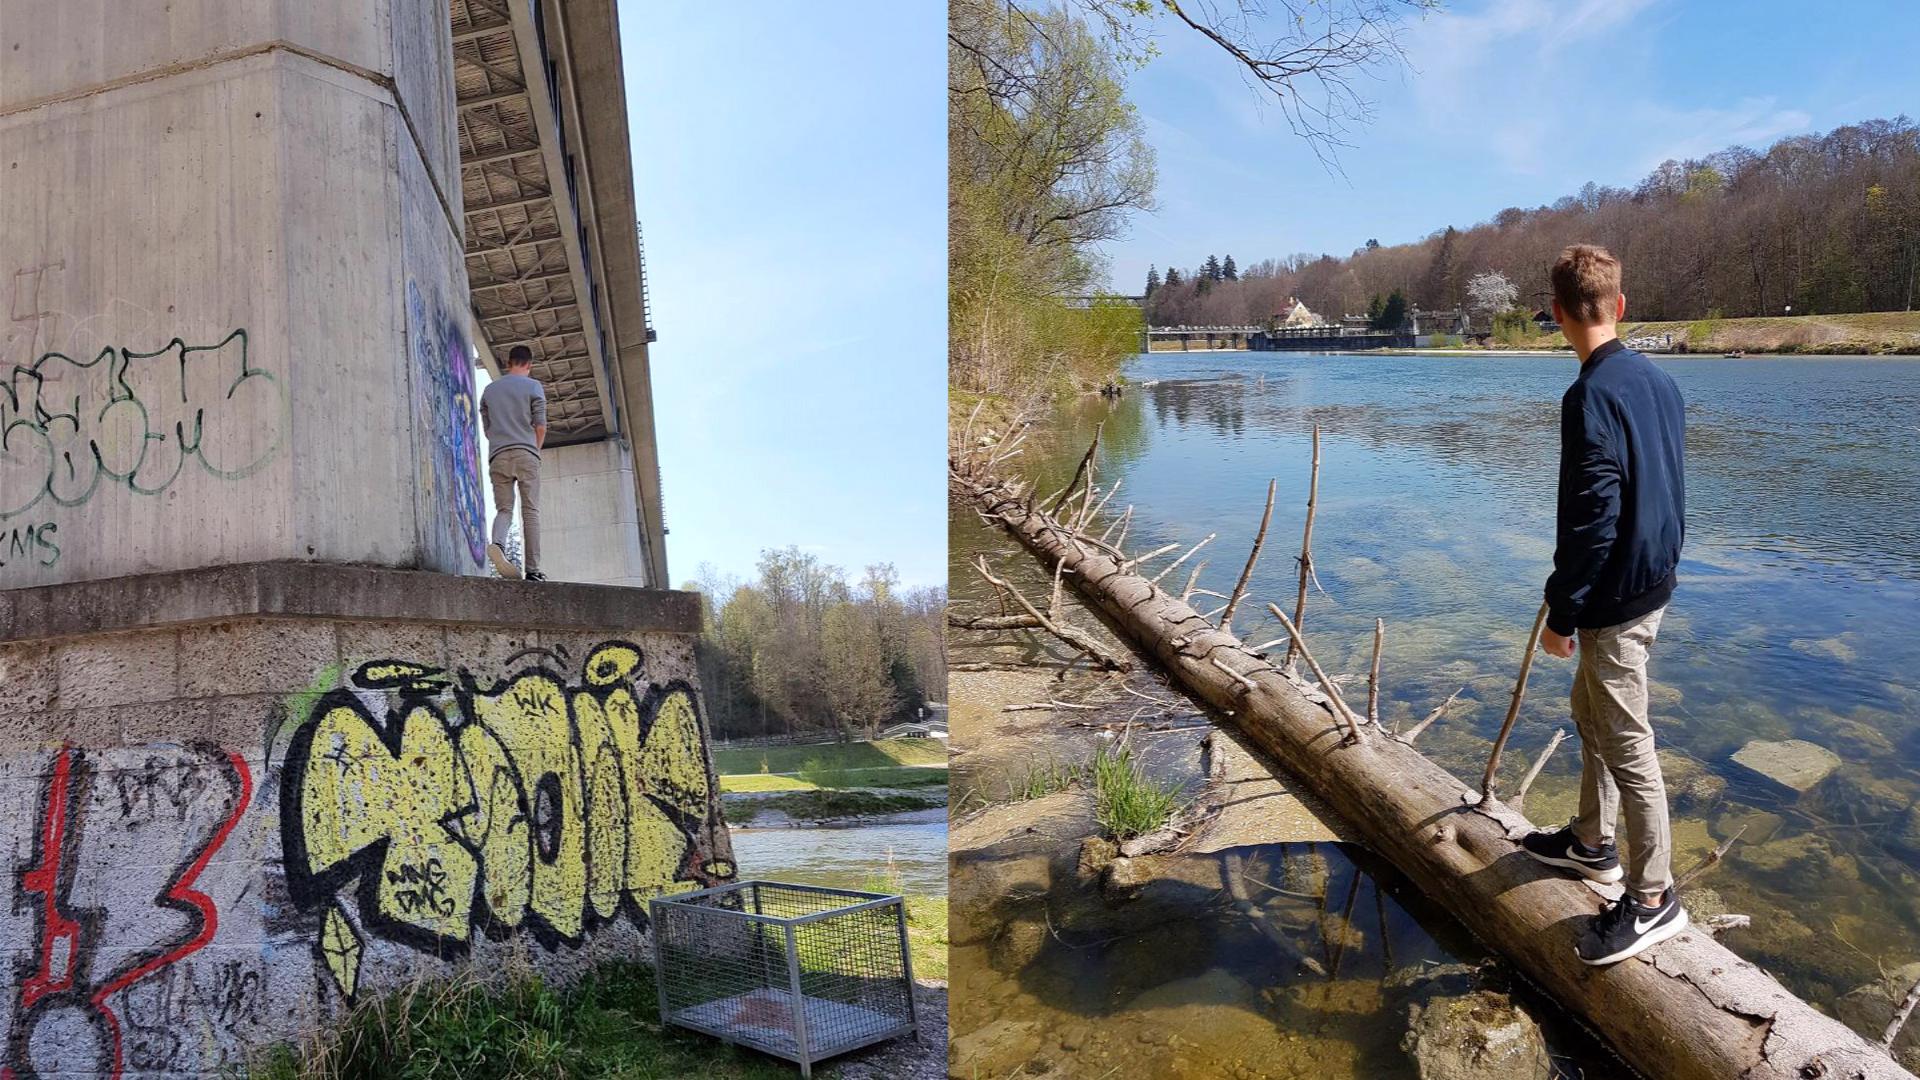 Wir holen uns Inspiration für unser Graffiti Projekt.